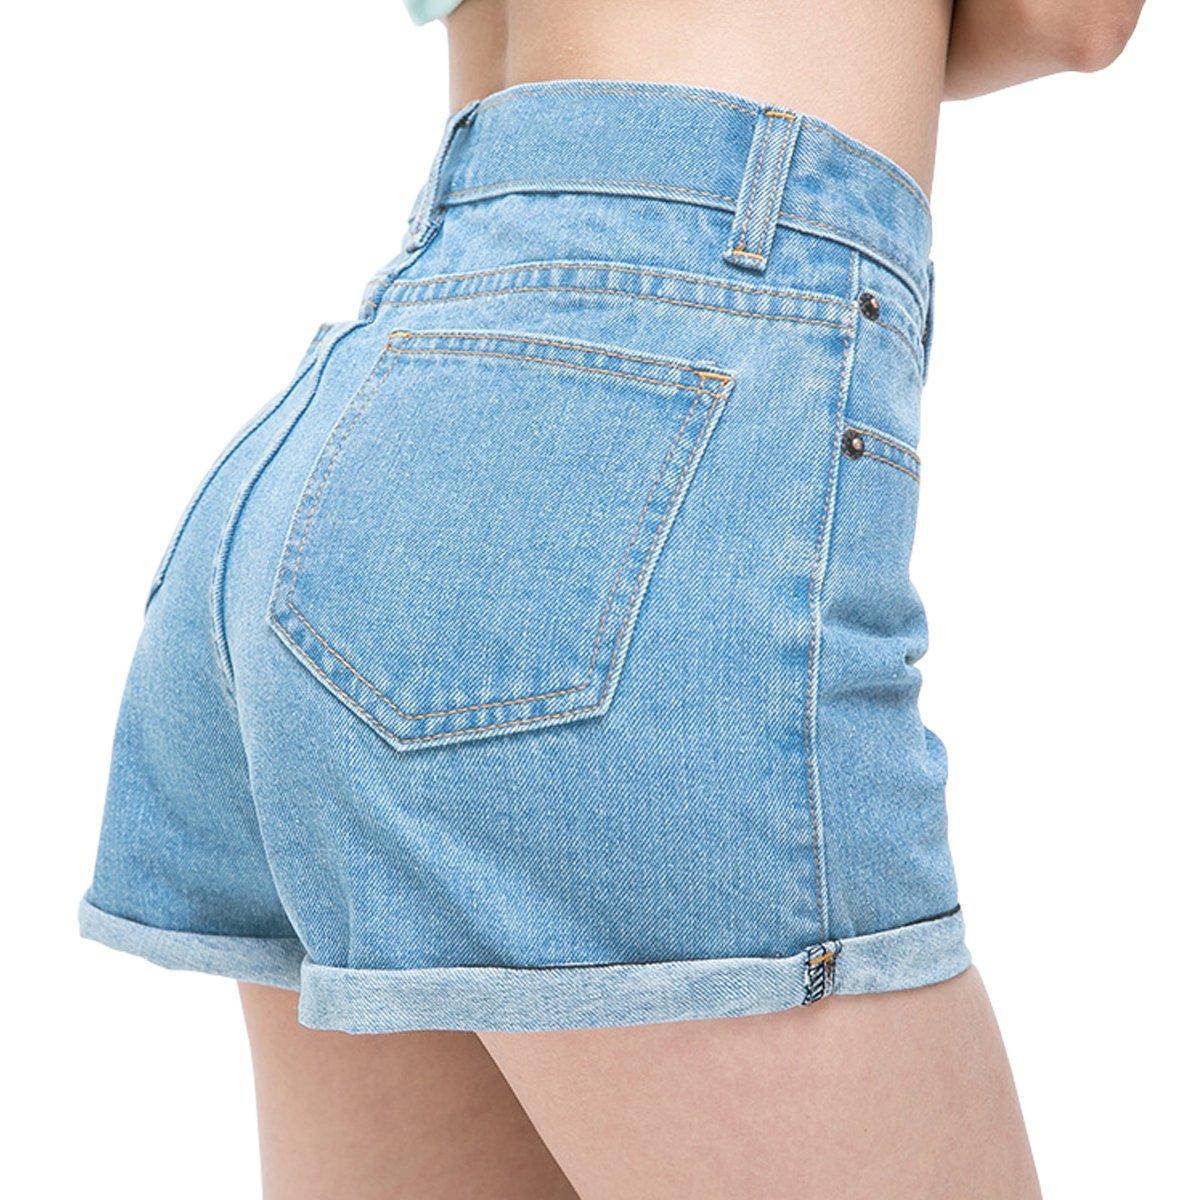 Womtop Summer Women Shorts Vintage Retro Junior Jean Shorts High Waist Crimping Denim Shorts Women (M, Blue)